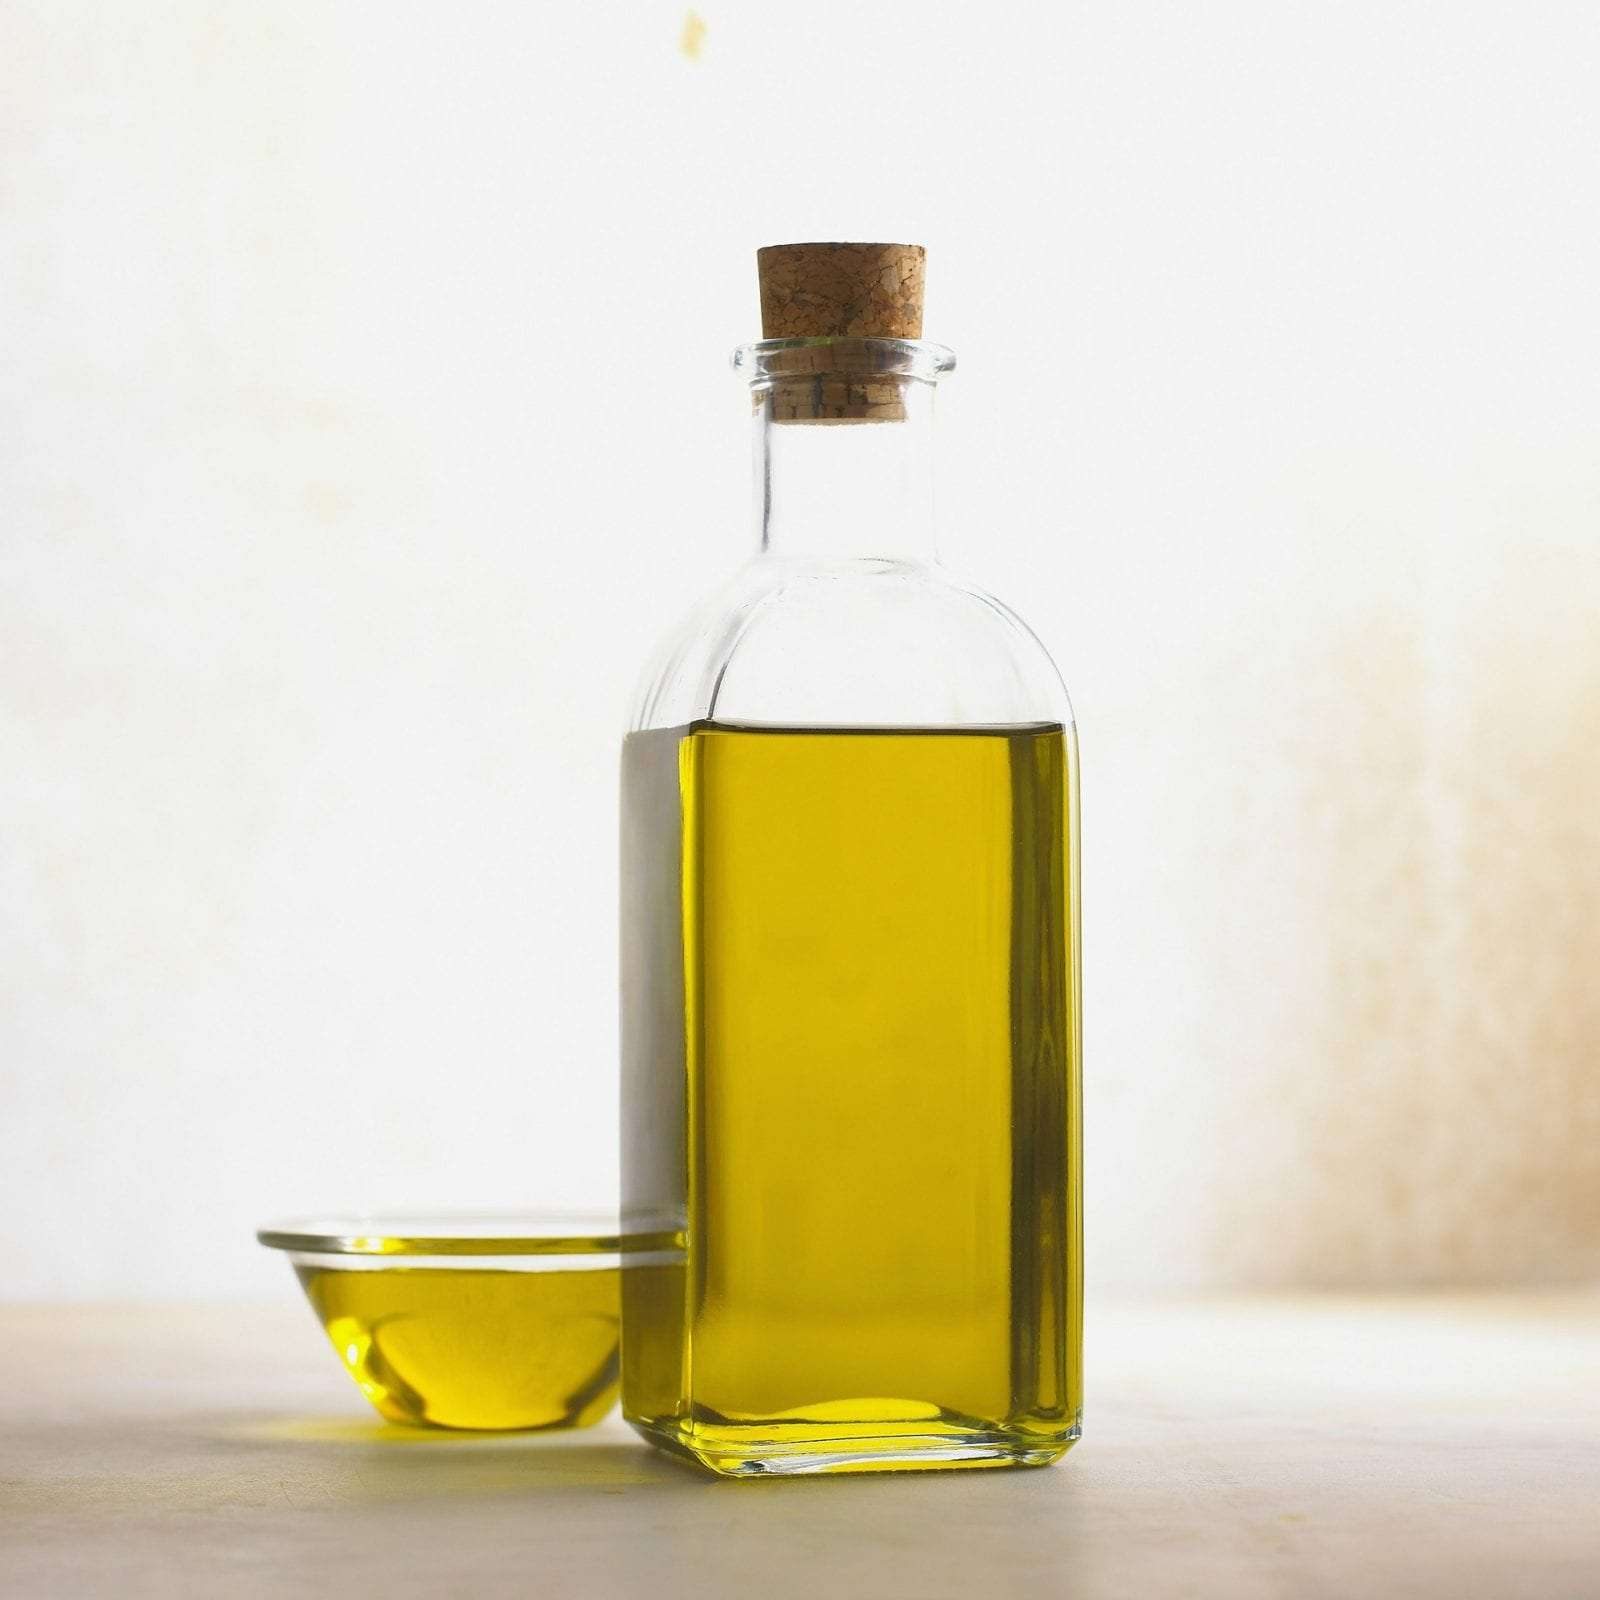 Hausmittel gegen Läuse mit Olivenöl